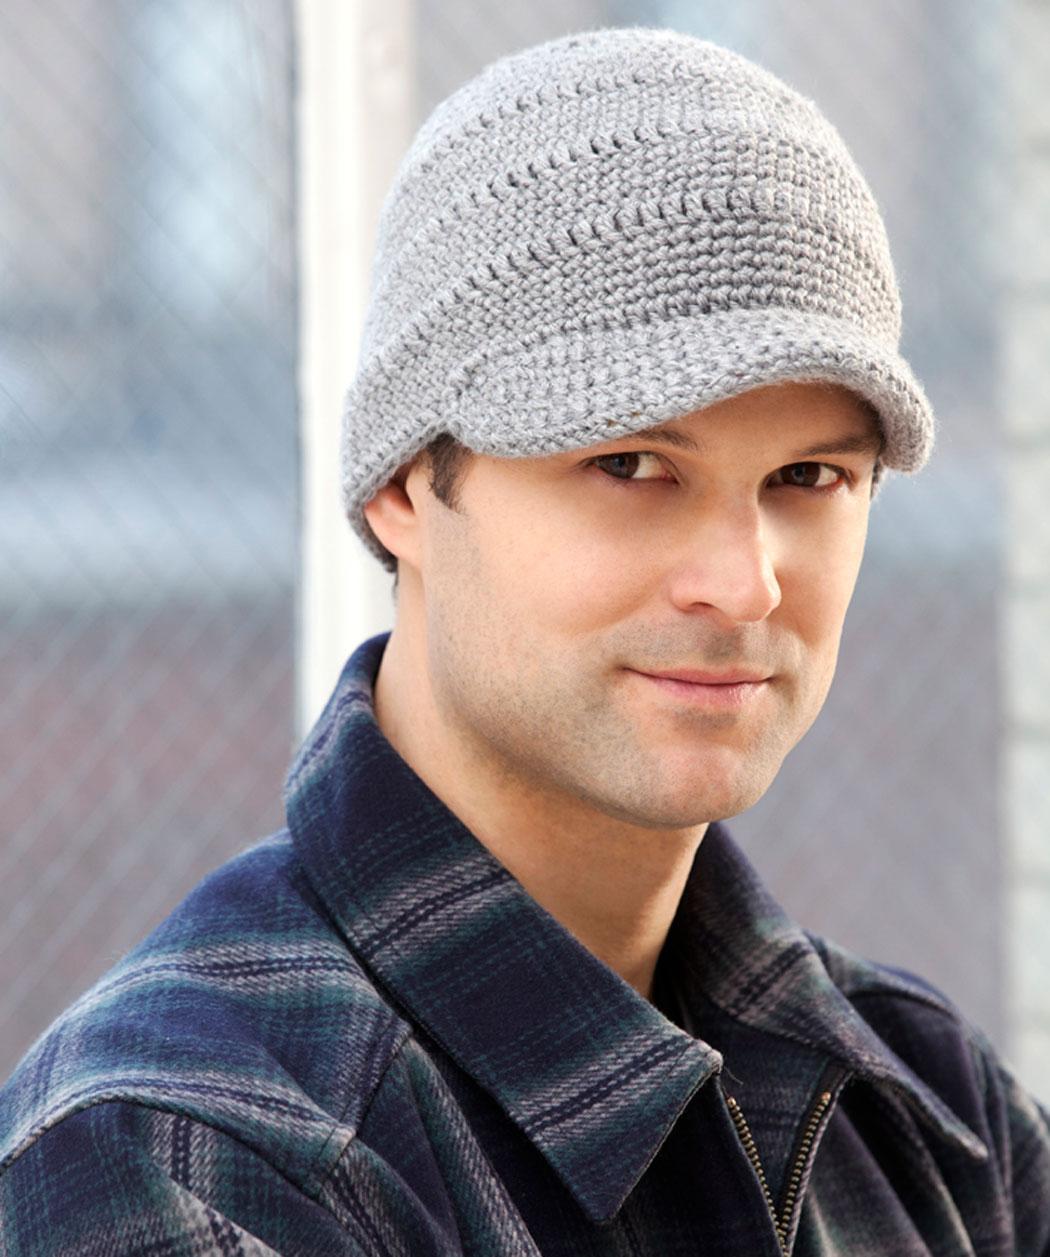 Men's Knit Hat Pattern | A Knitting Blog